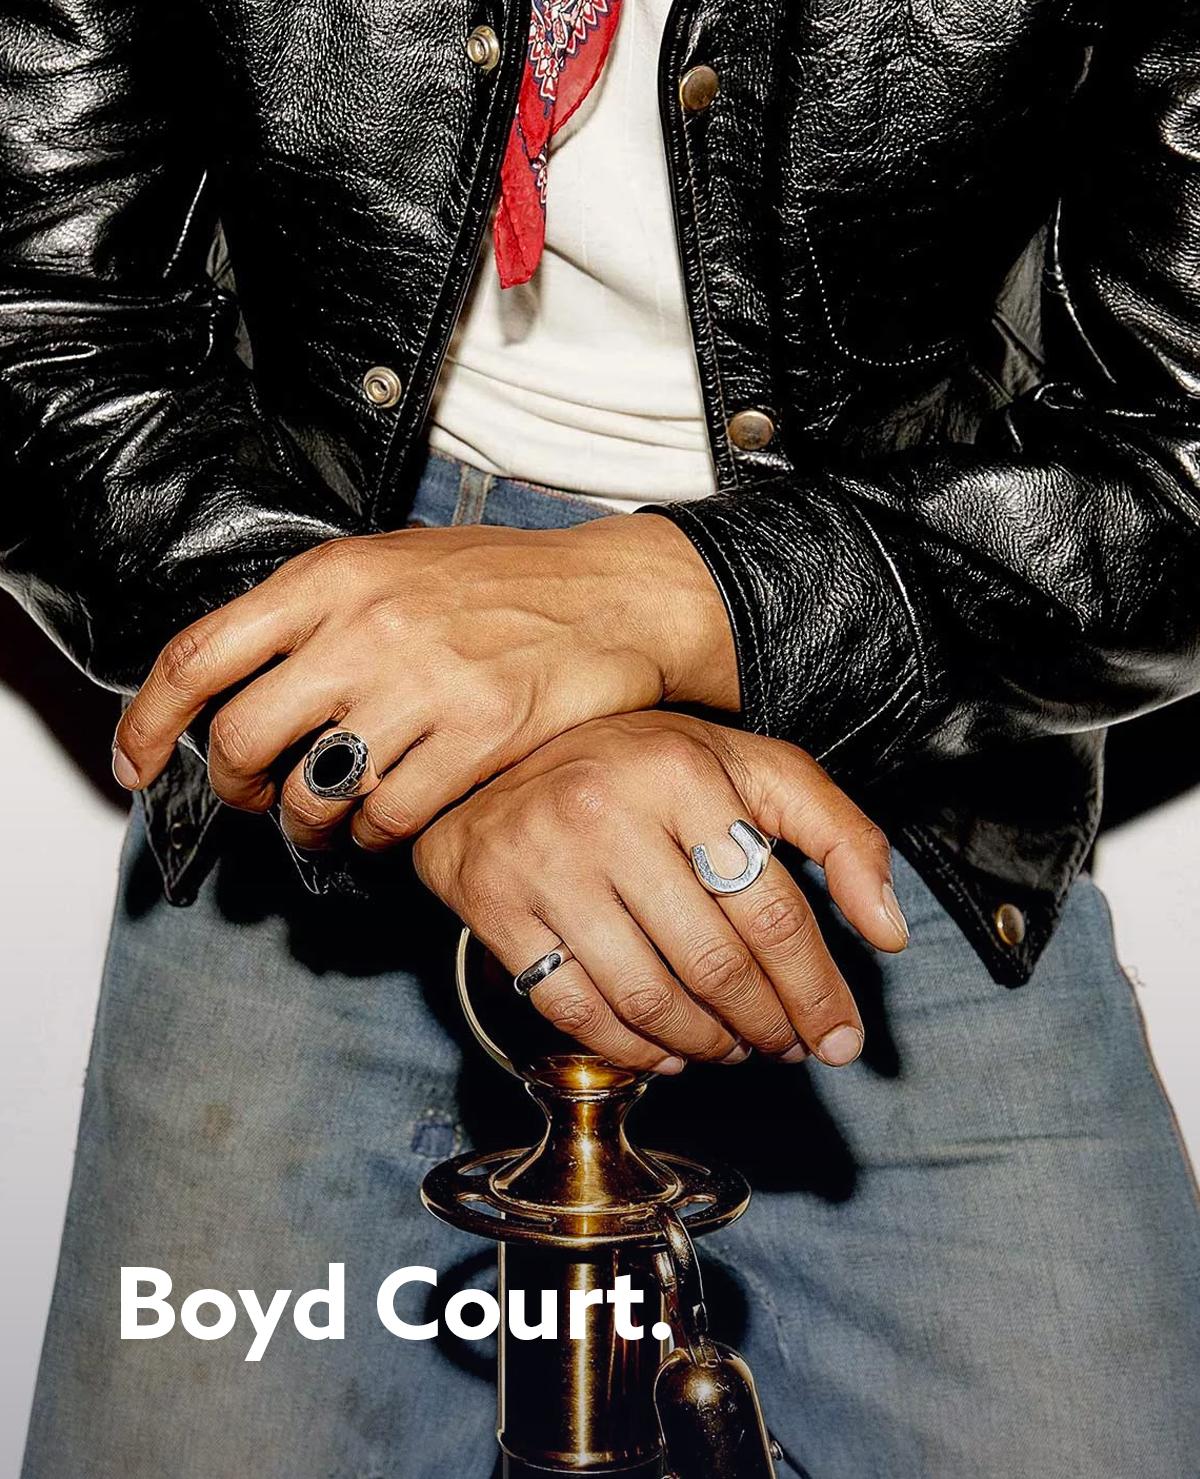 Boyd Court